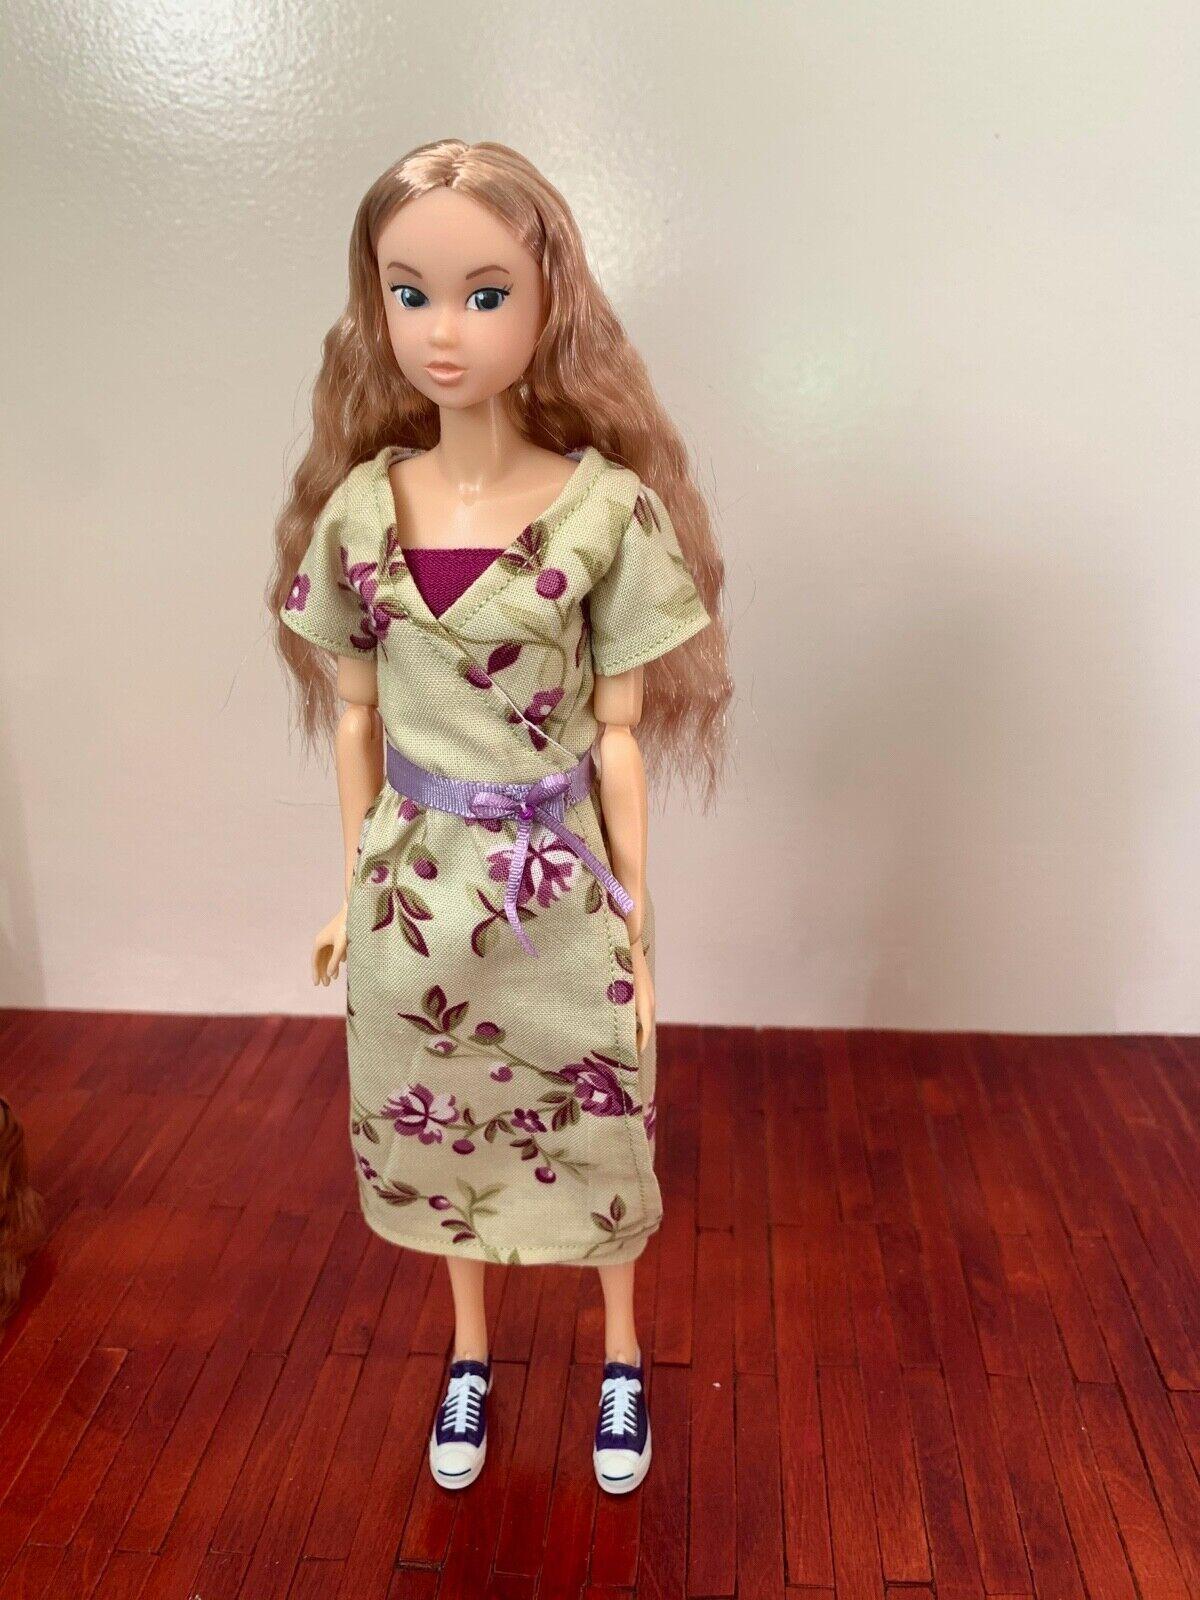 Dress for Momoko doll 1/6 scale.